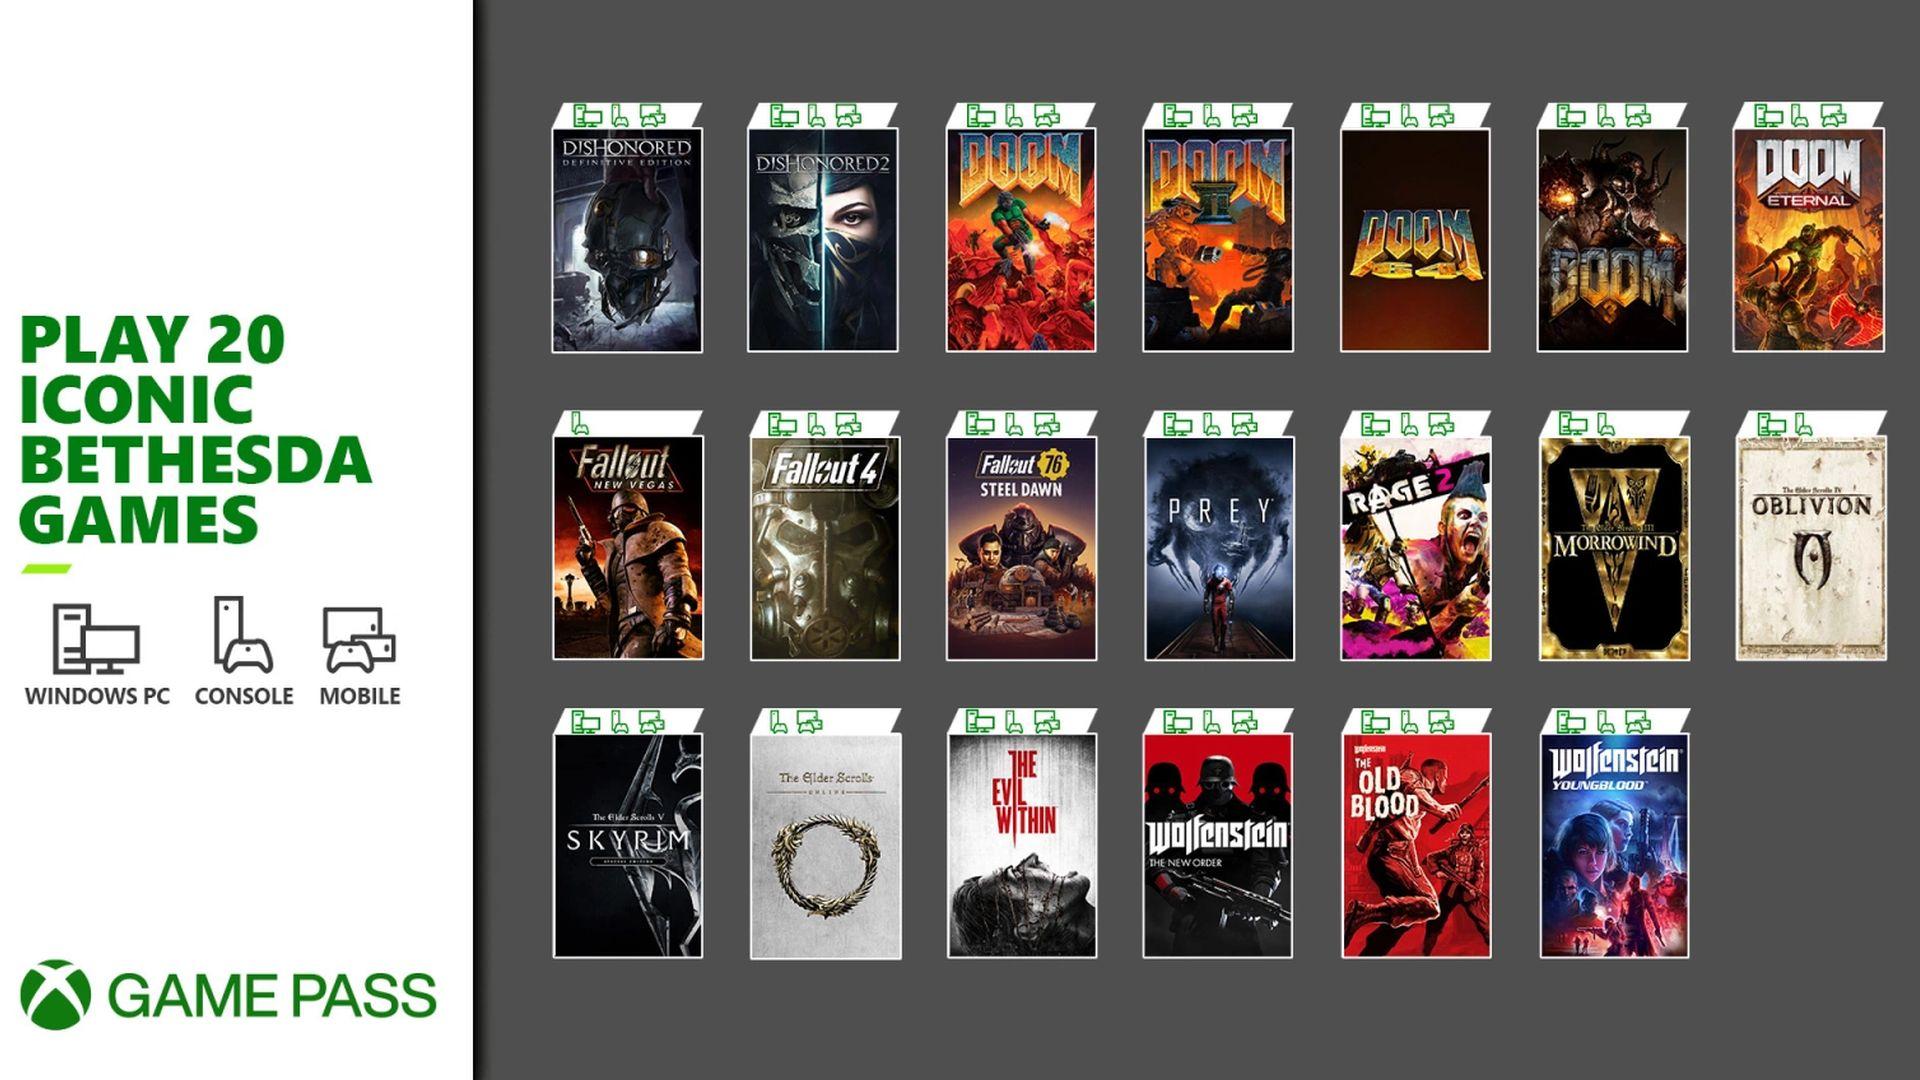 Xbox Game Pass - Bethesda titles